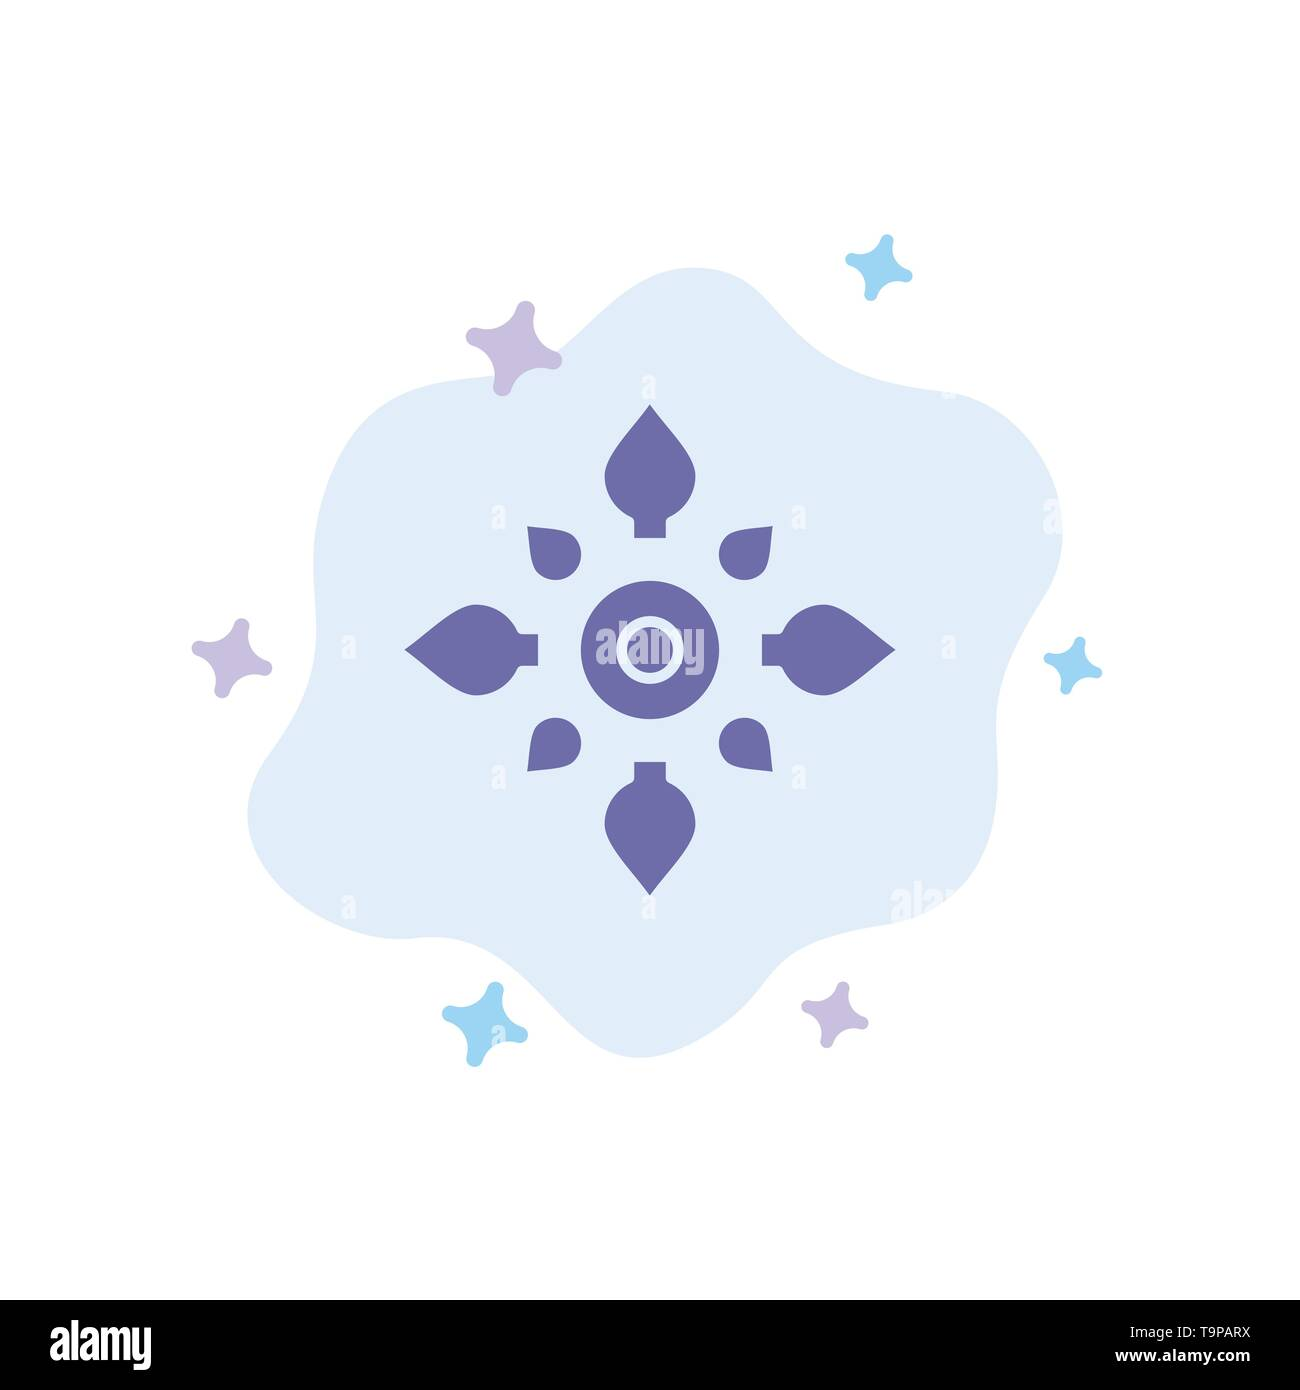 Celebrate, Decorate, Decoration, Diwali, Hindu, Holi Blue Icon on Abstract Cloud Background - Stock Image